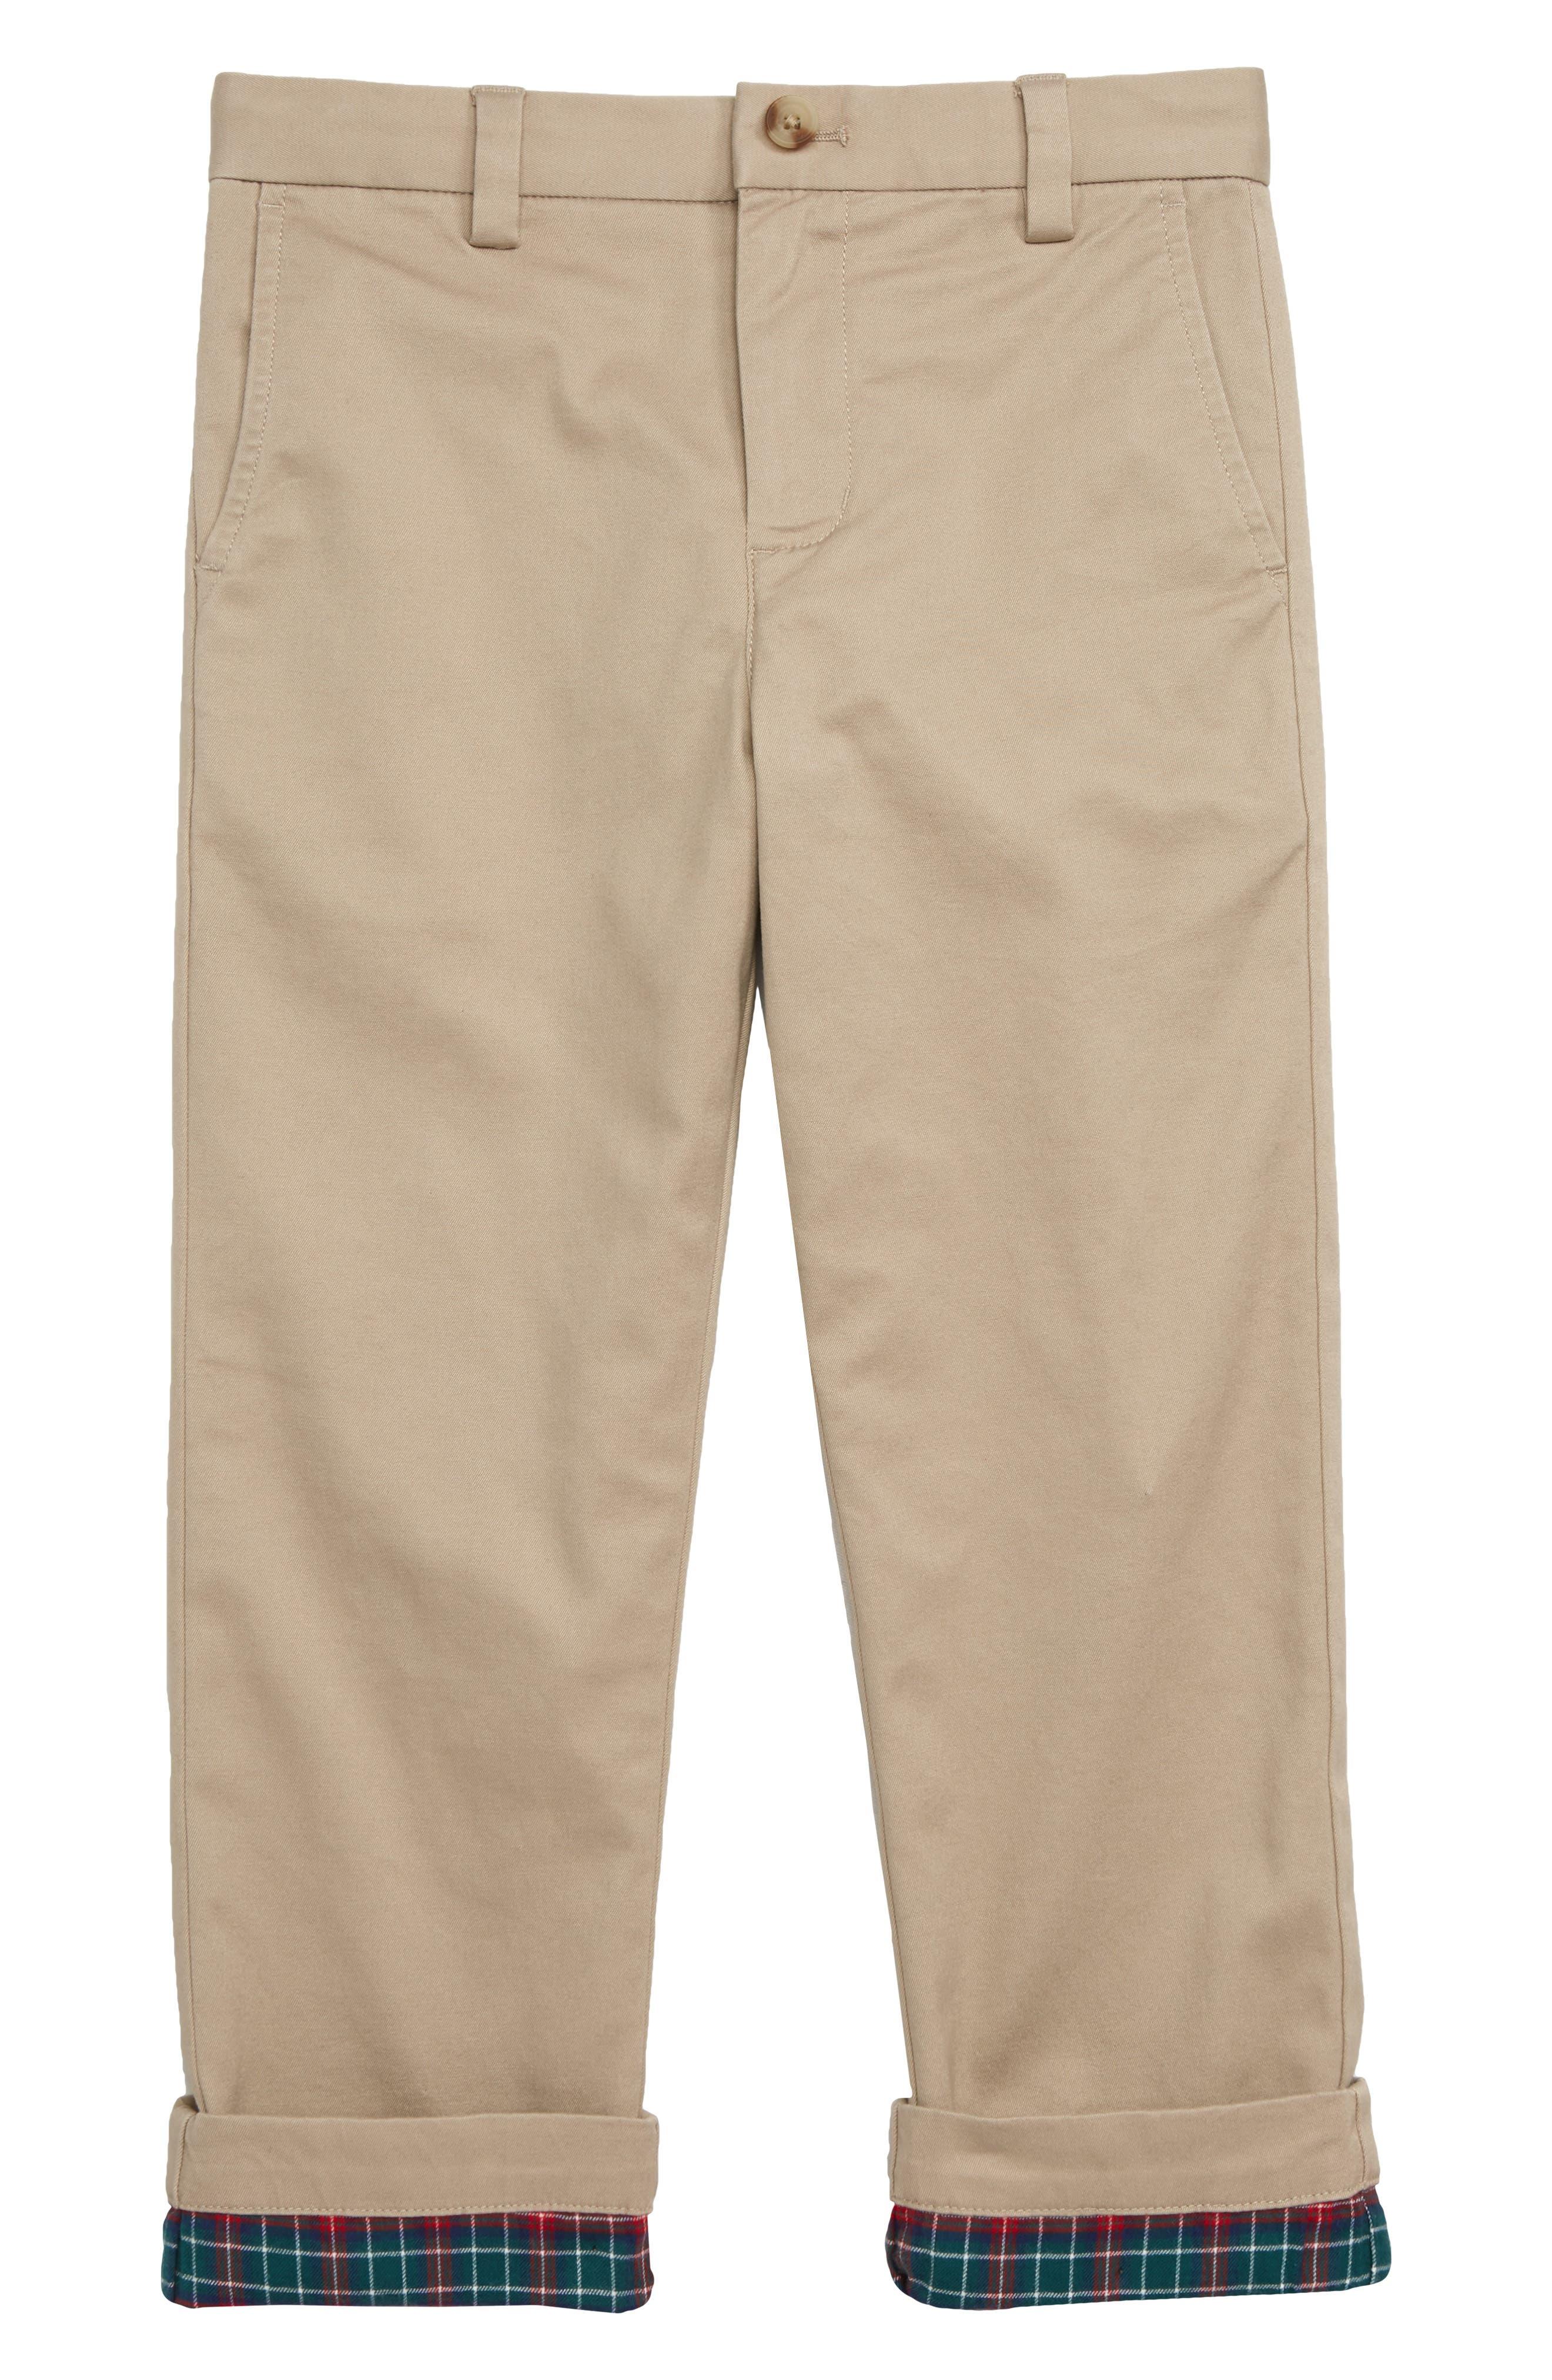 Toddler Boys Vineyard Vines Flannel Lined Breaker Pants Size 4T  Beige